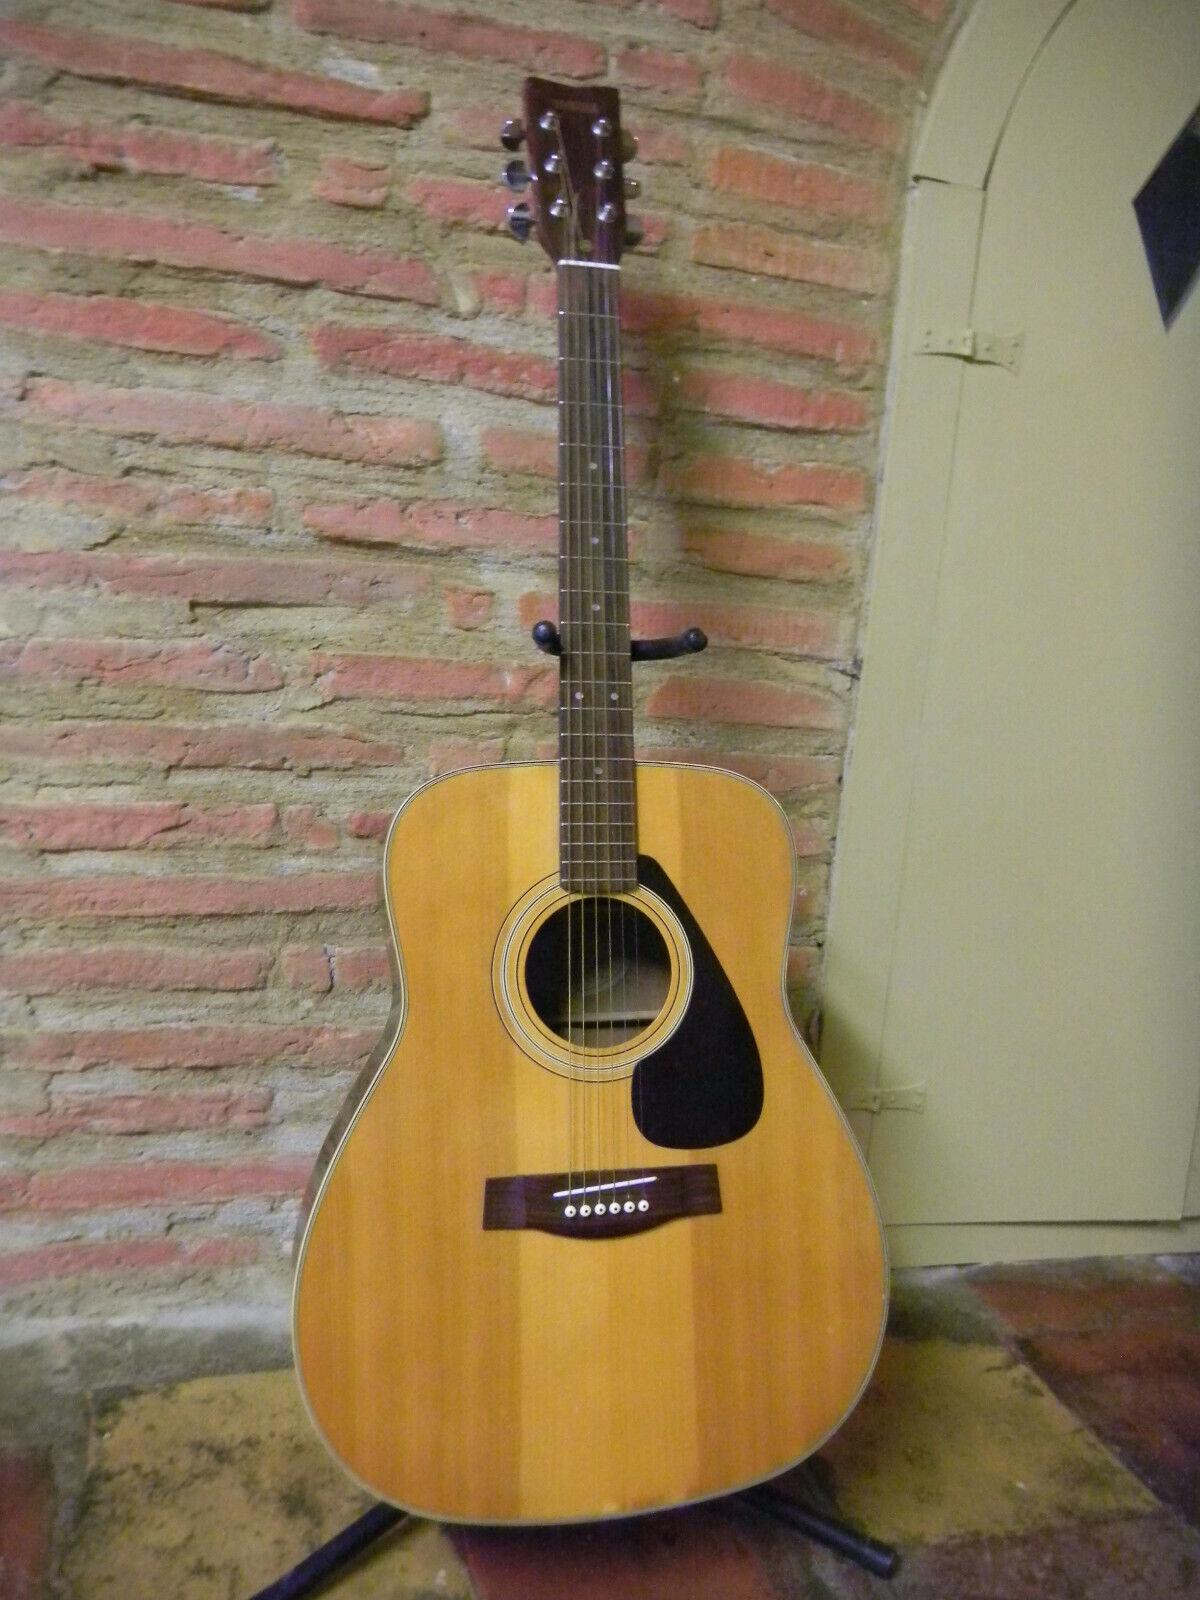 Guitare FOLK YAMAHA 80' FG335 FG-335 DREADNOUGHT RARE bel état a saisir